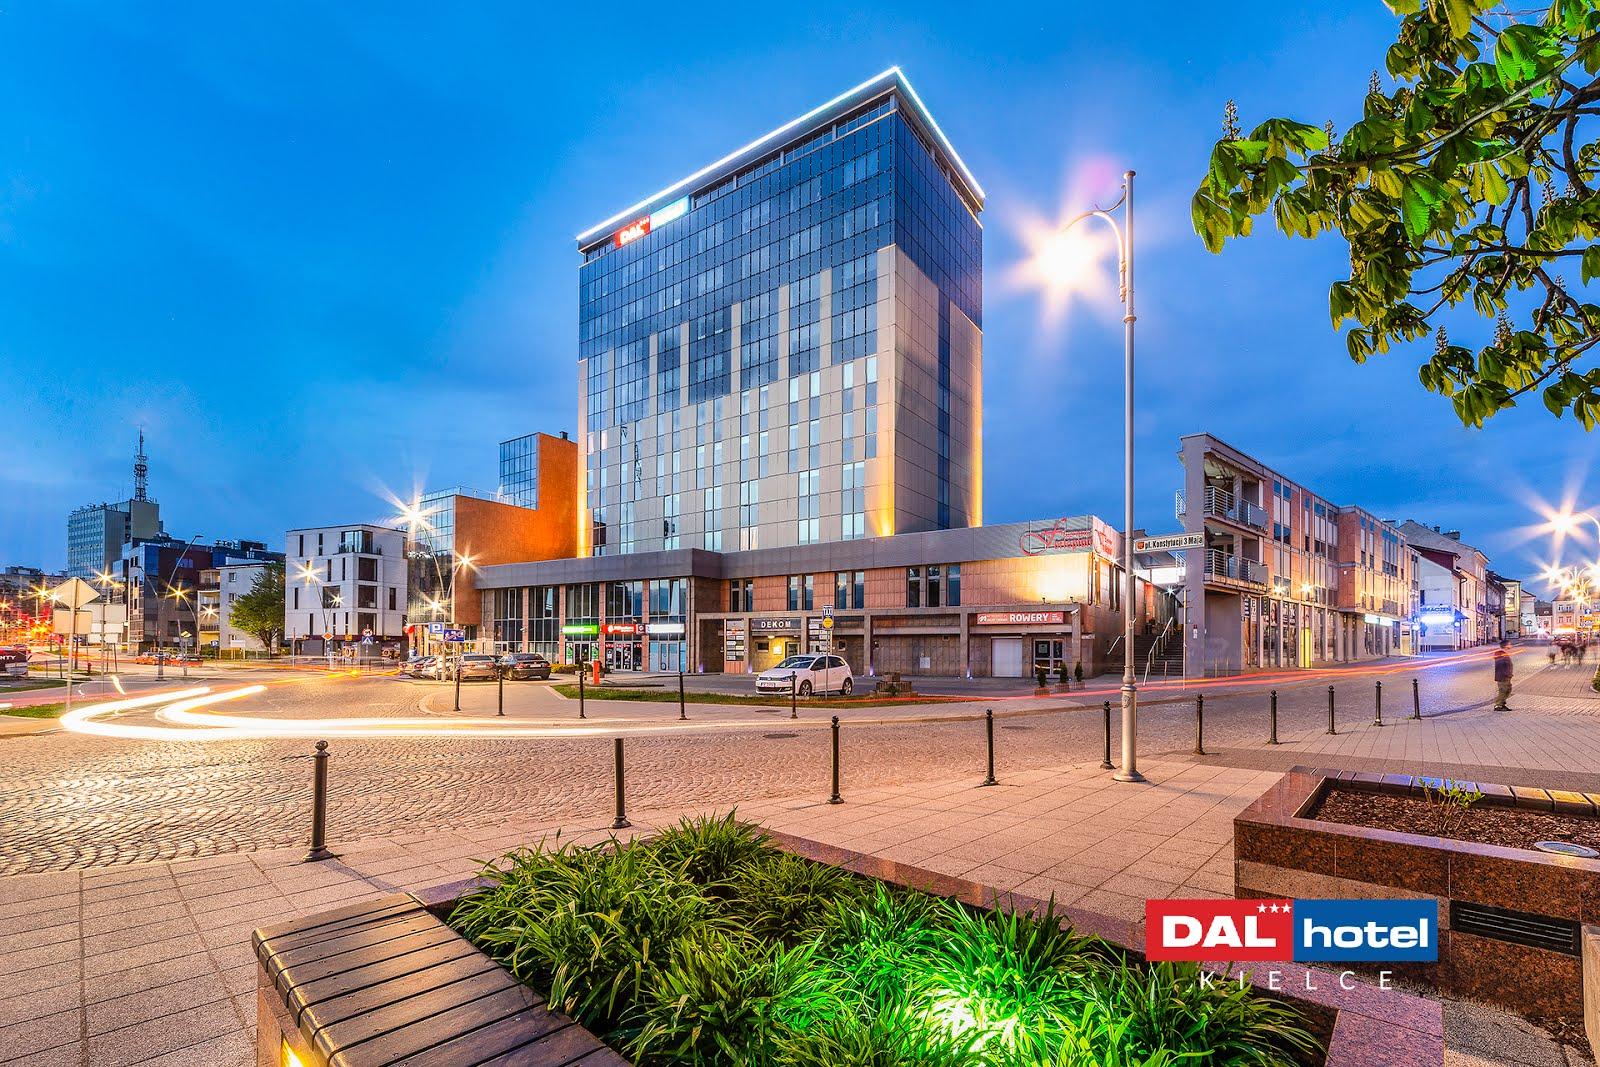 Hotel Dal Kielce